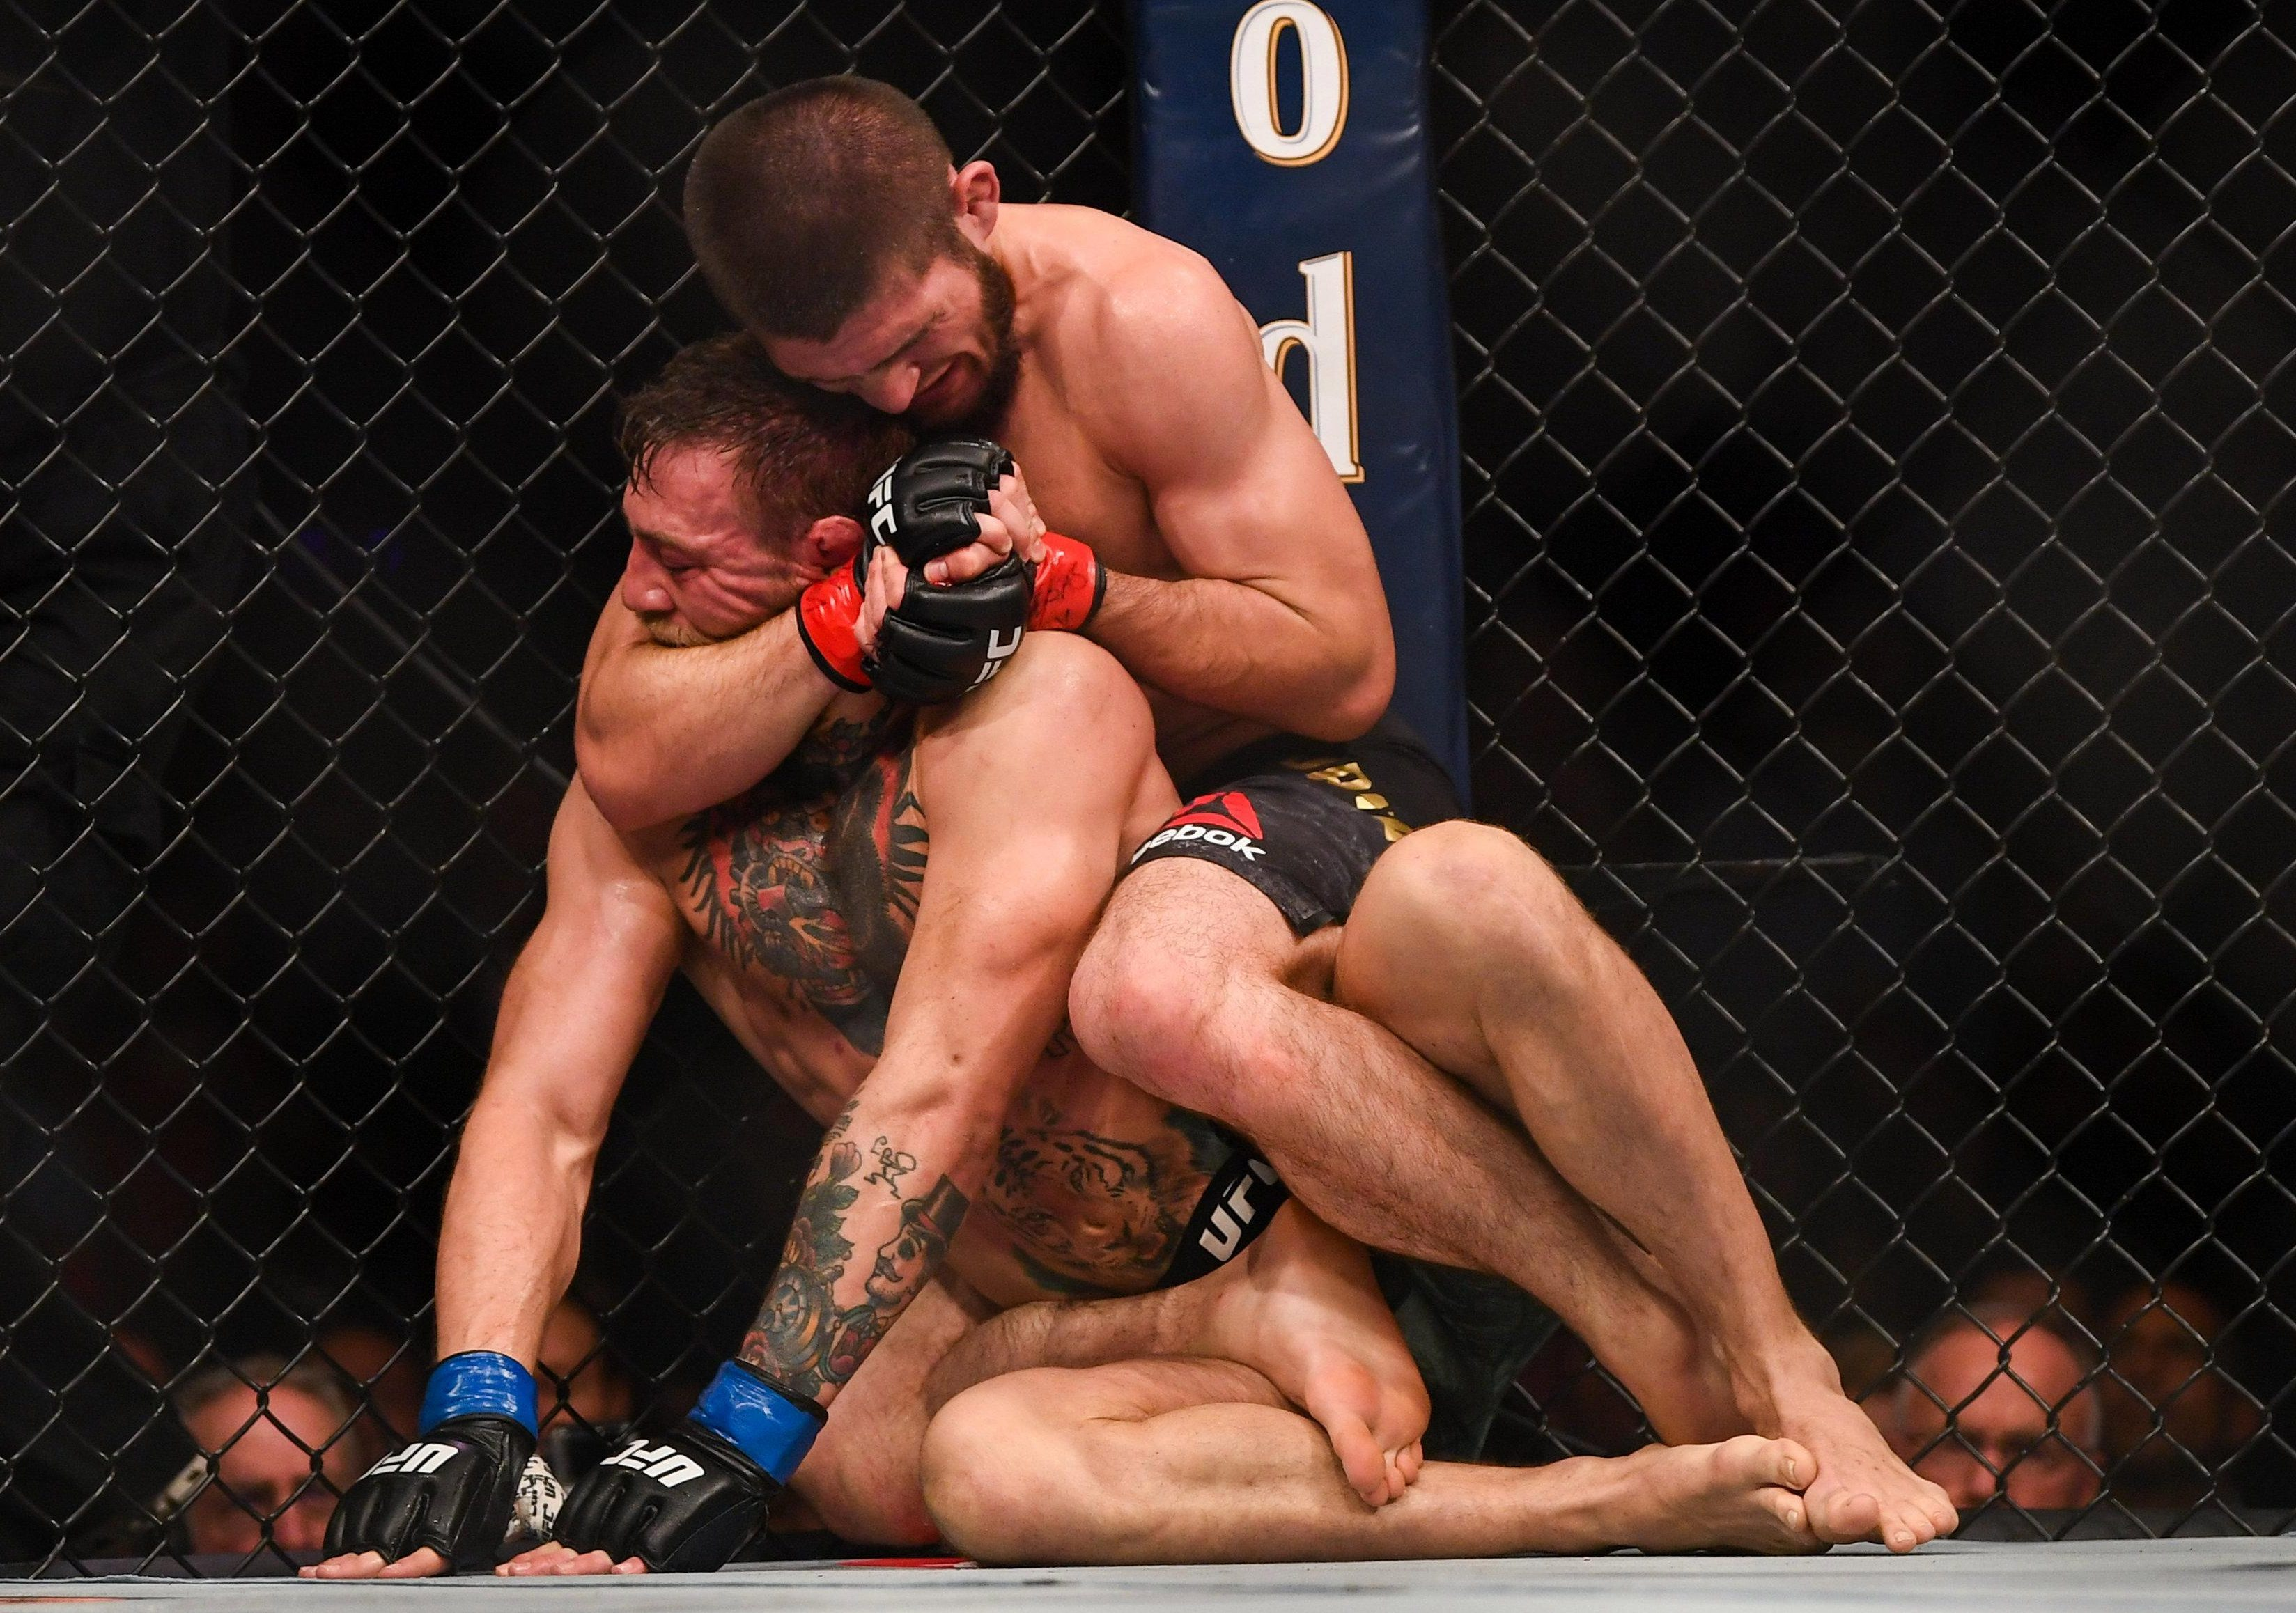 Conor McGregor suffered his fourth professional MMA defeat against Khabib Nurmagomedov